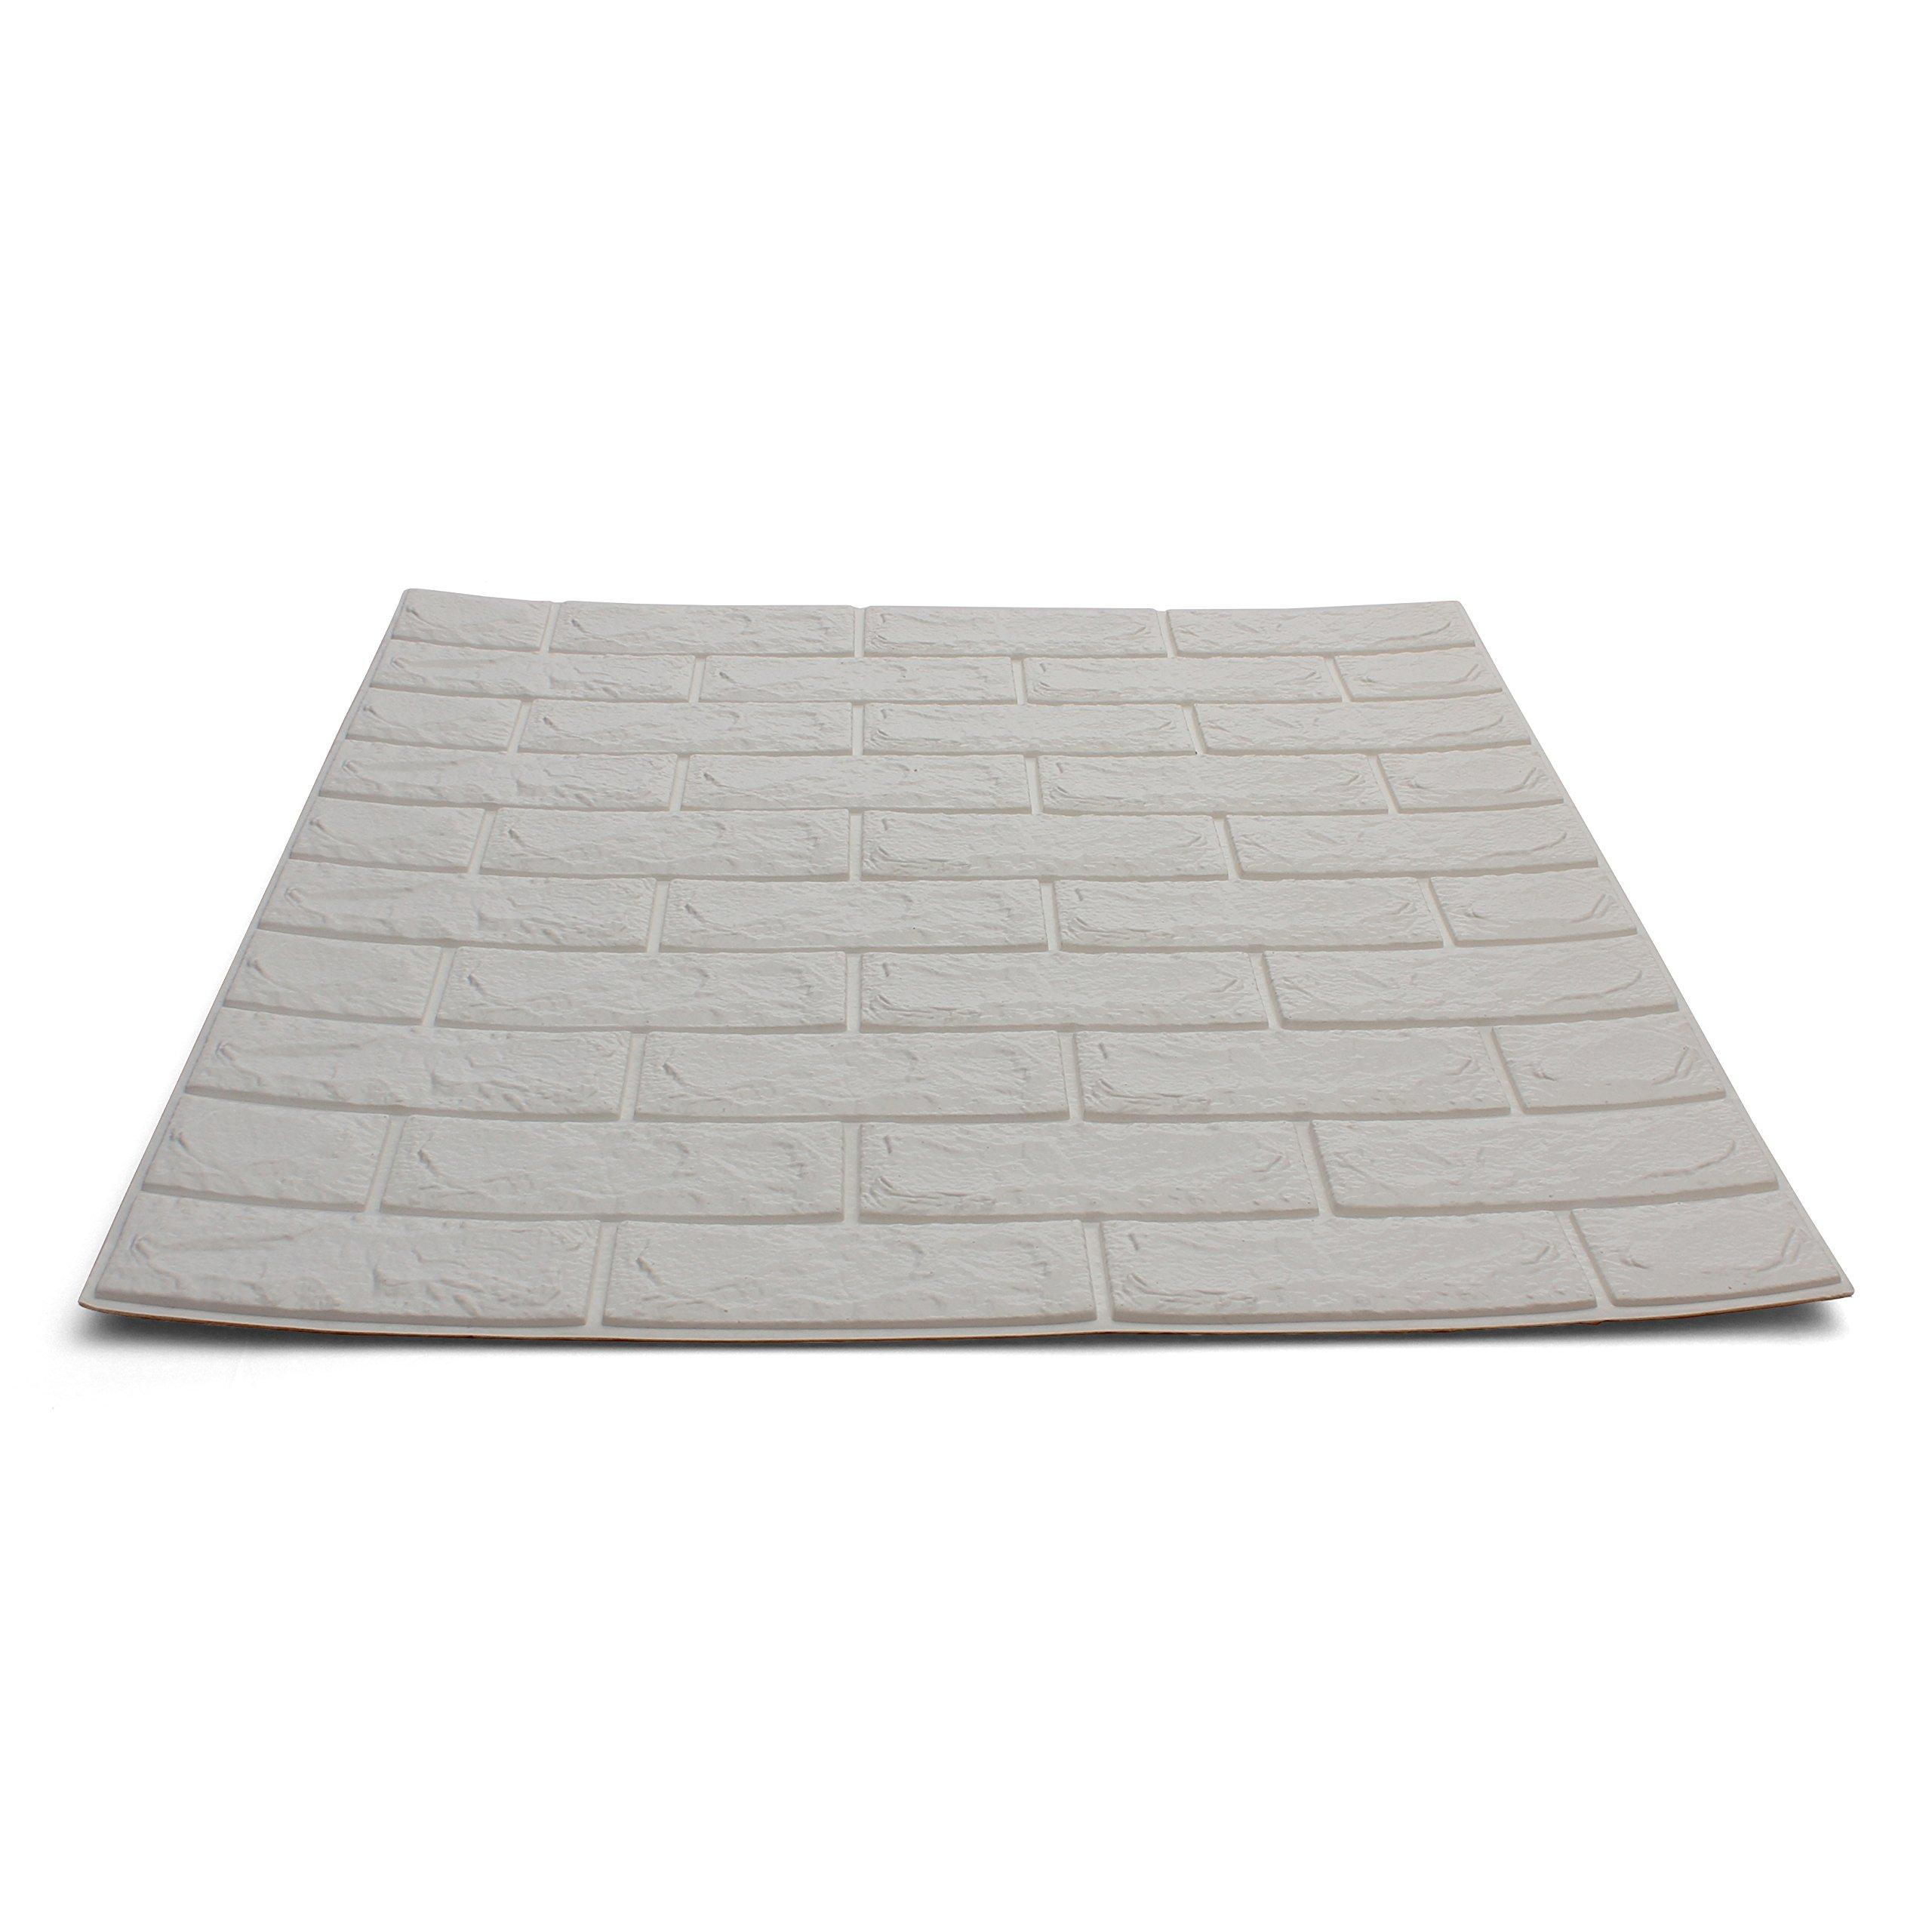 Craft Faux Brick Wall Panels - Peel and Stick Foam Brick - 3D Wall Panels for Fake Brick Wall - Self Adhesive Brick Wall Panels - 3D Brick Wallpaper (20 Pack, White)